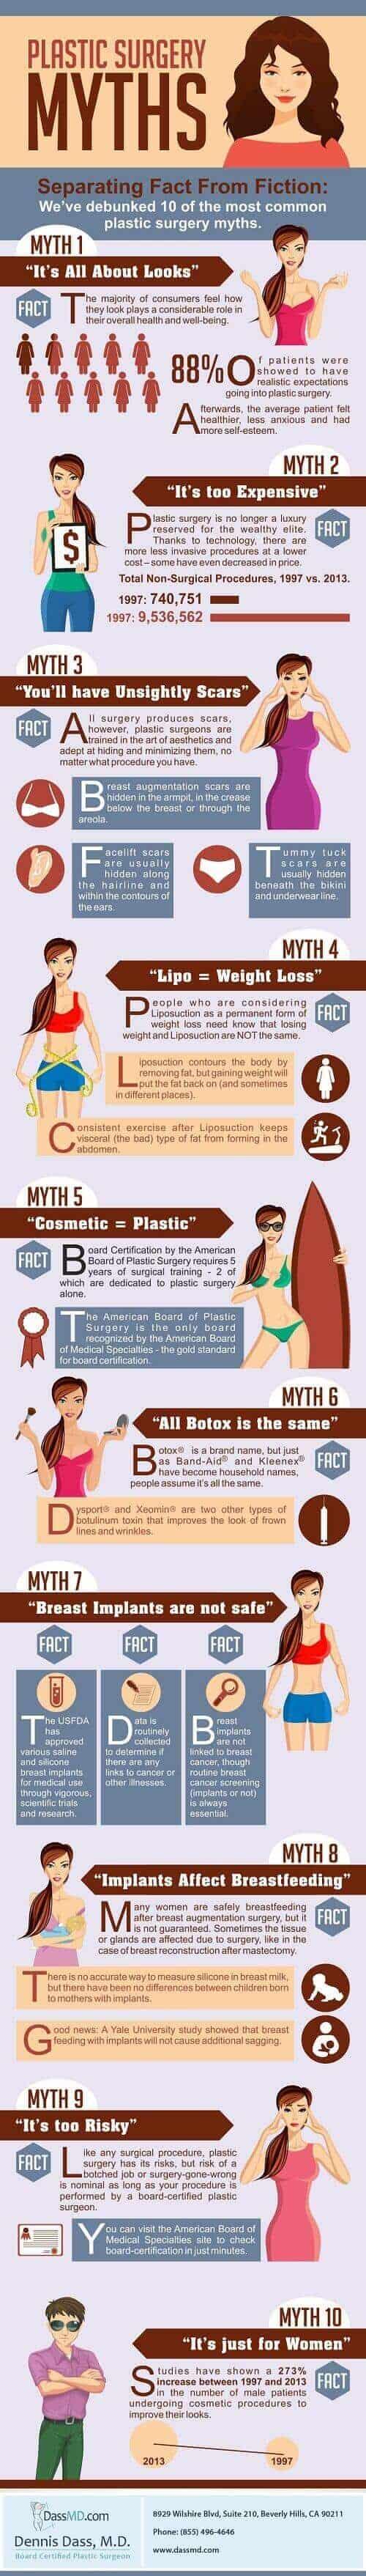 10-mitos-sobre-la-cirugia-plastica-al-descubierto-infografia